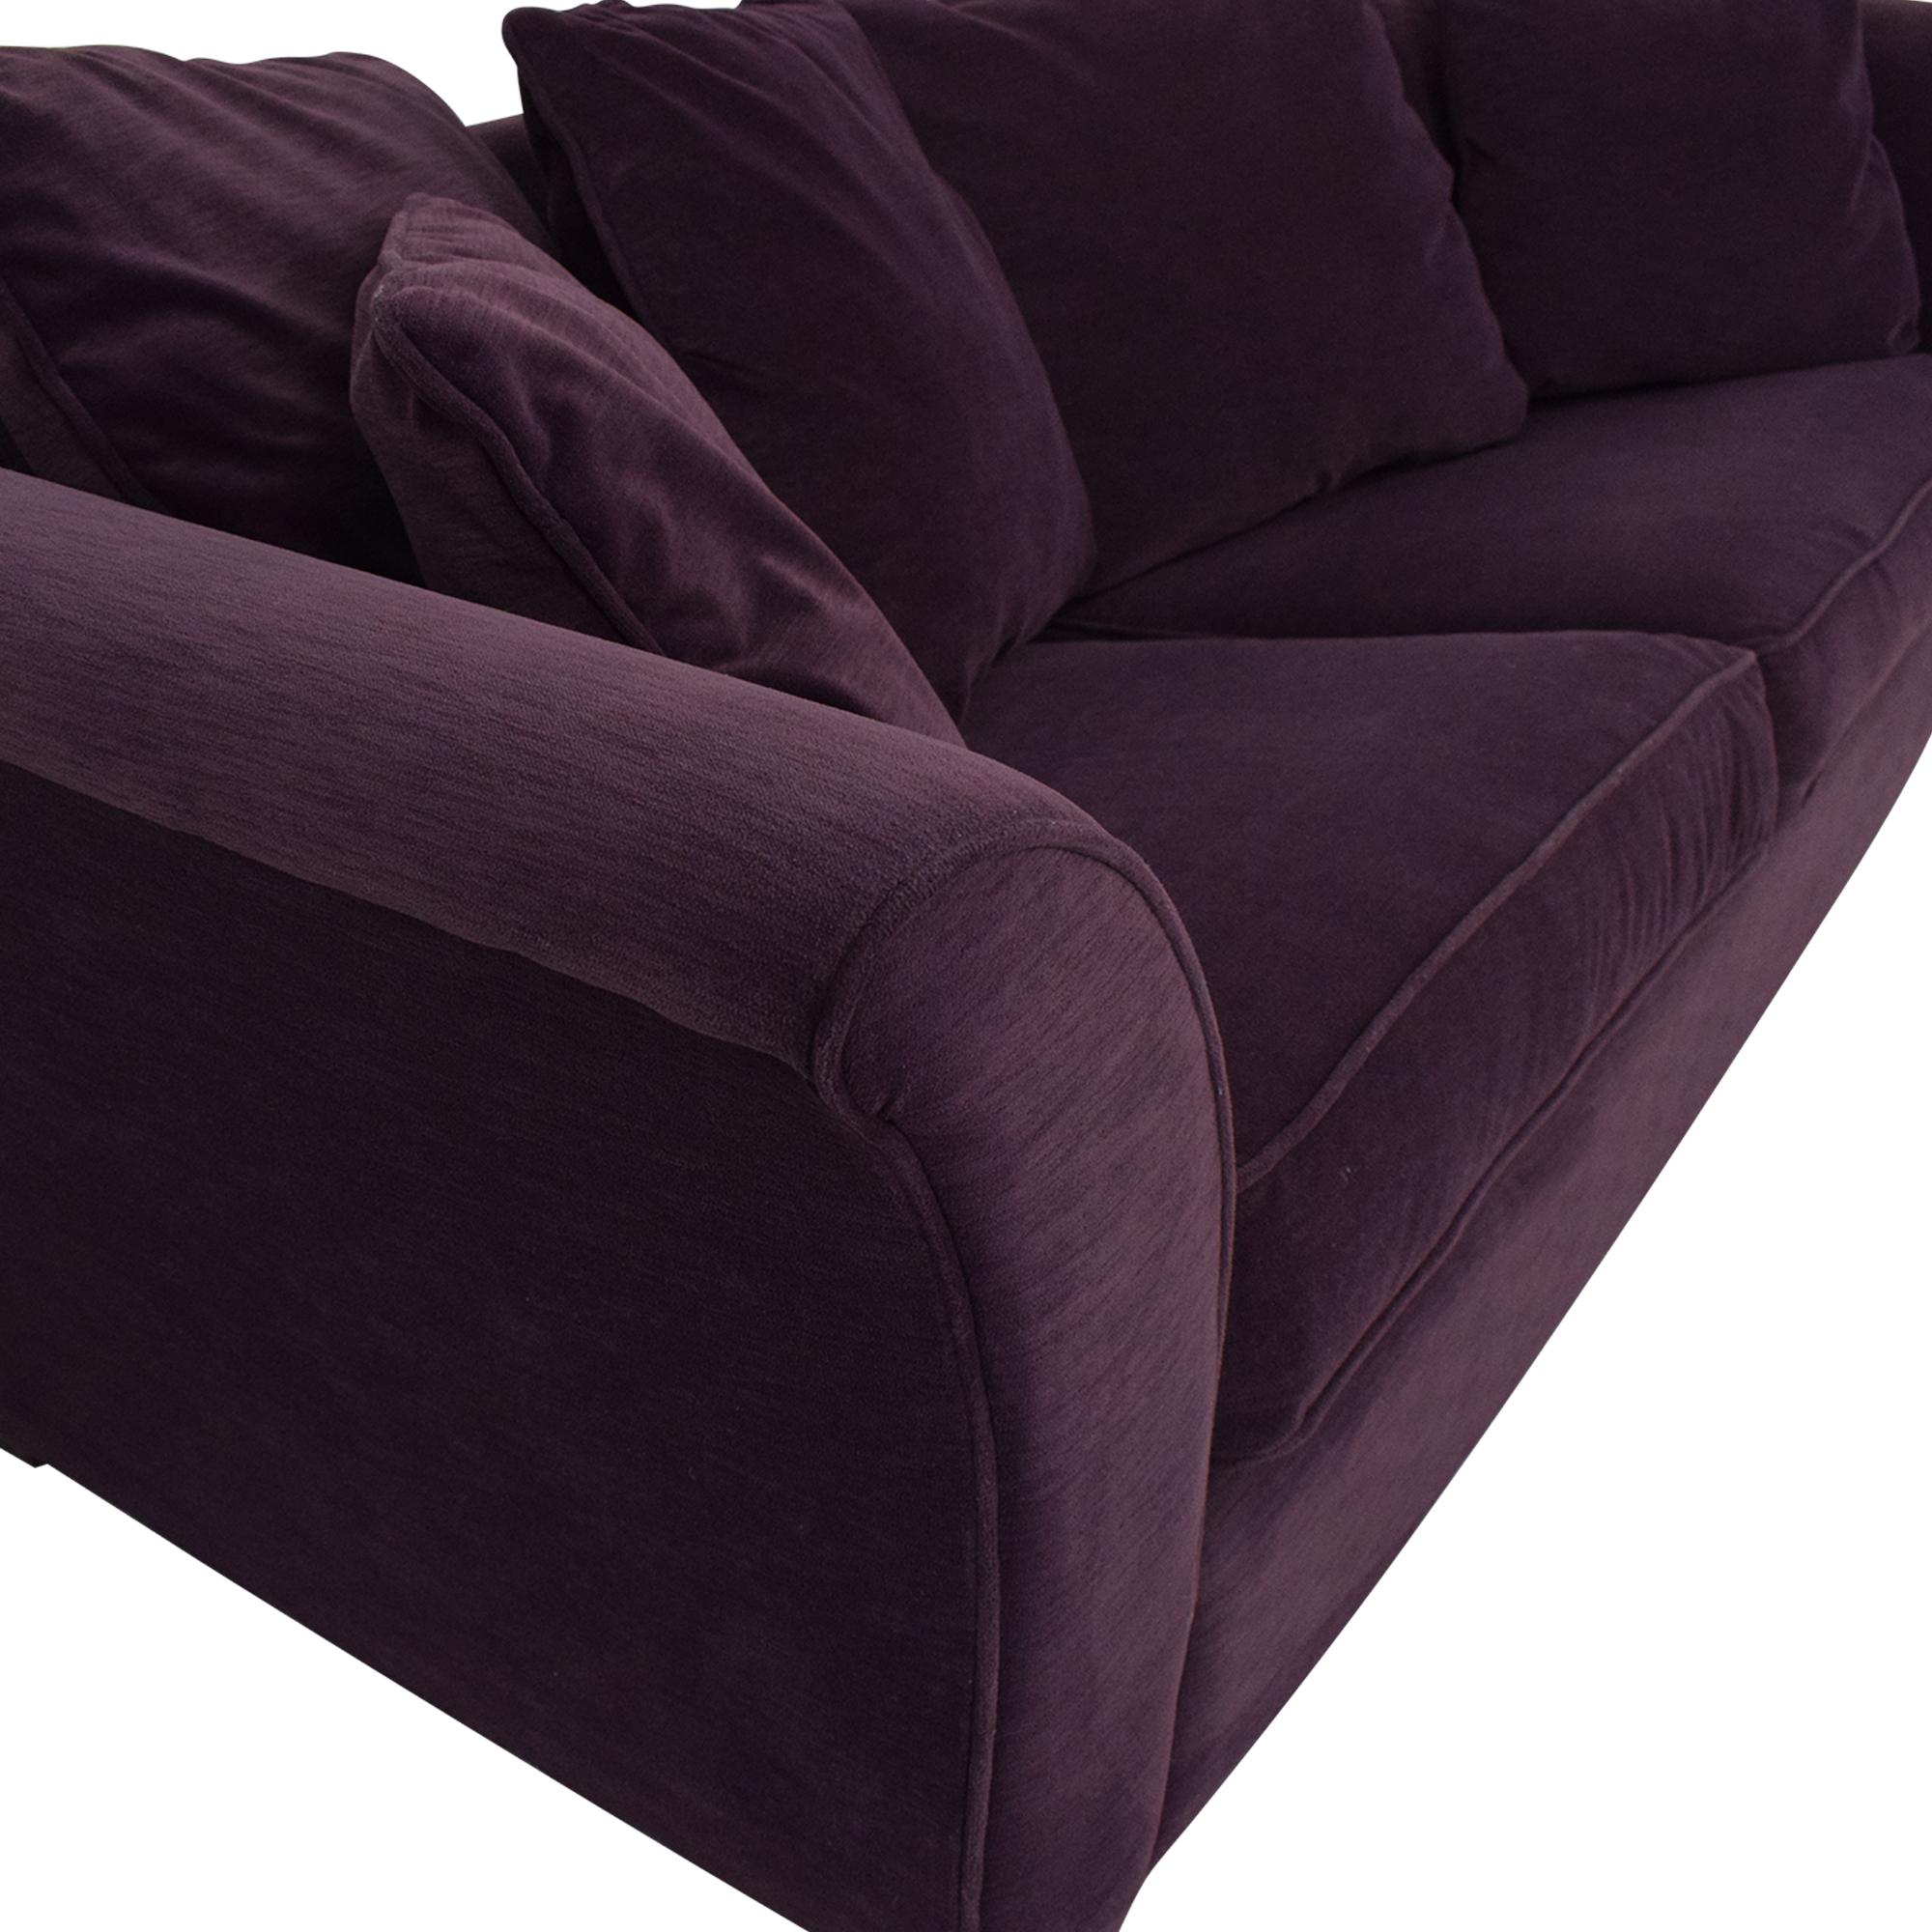 Taylor Made Furniture Taylor Made Sleeper Sofa dimensions